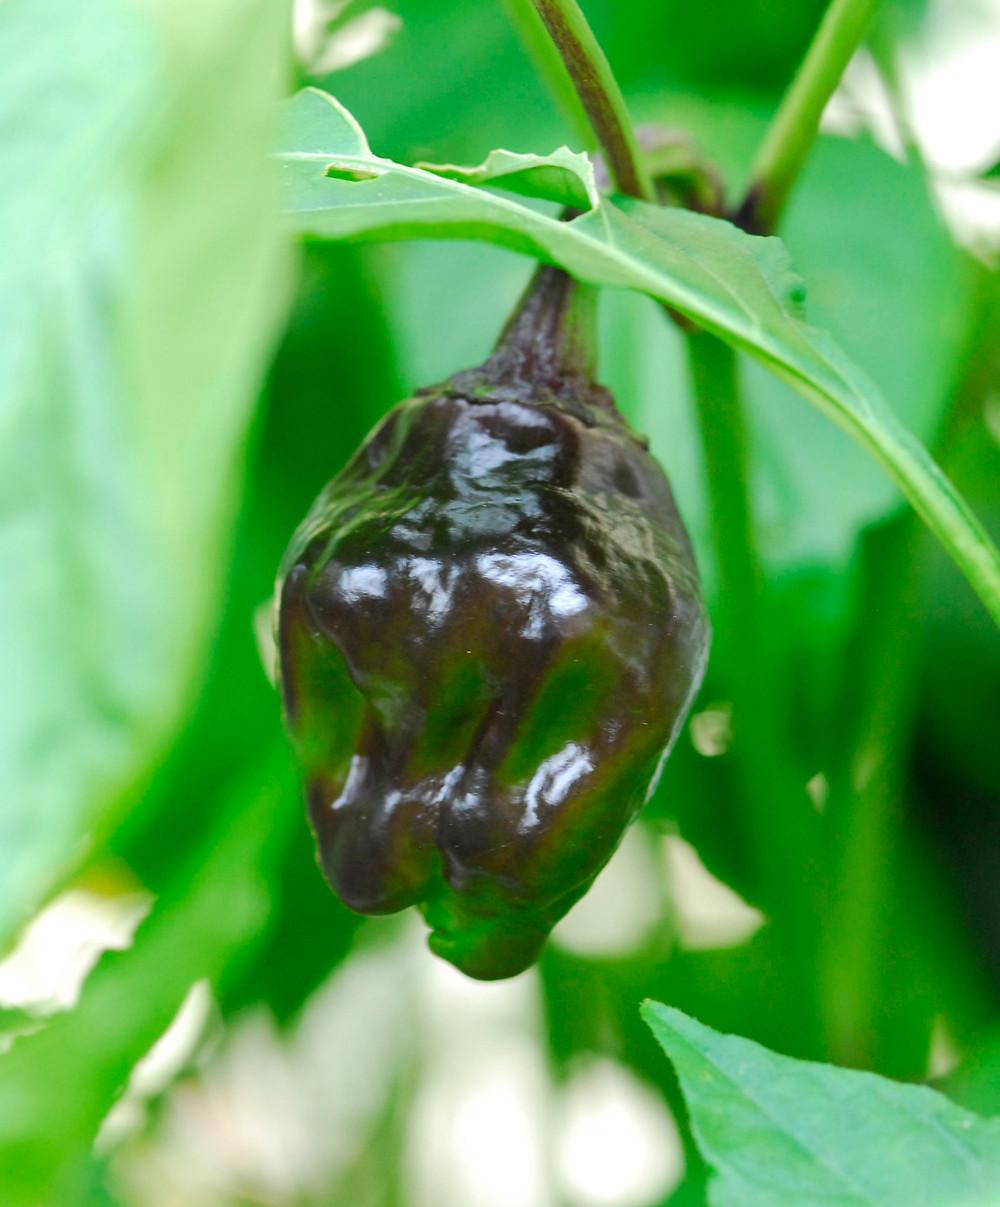 chili pepper—a chilhuacle negro black Oaxacan mole